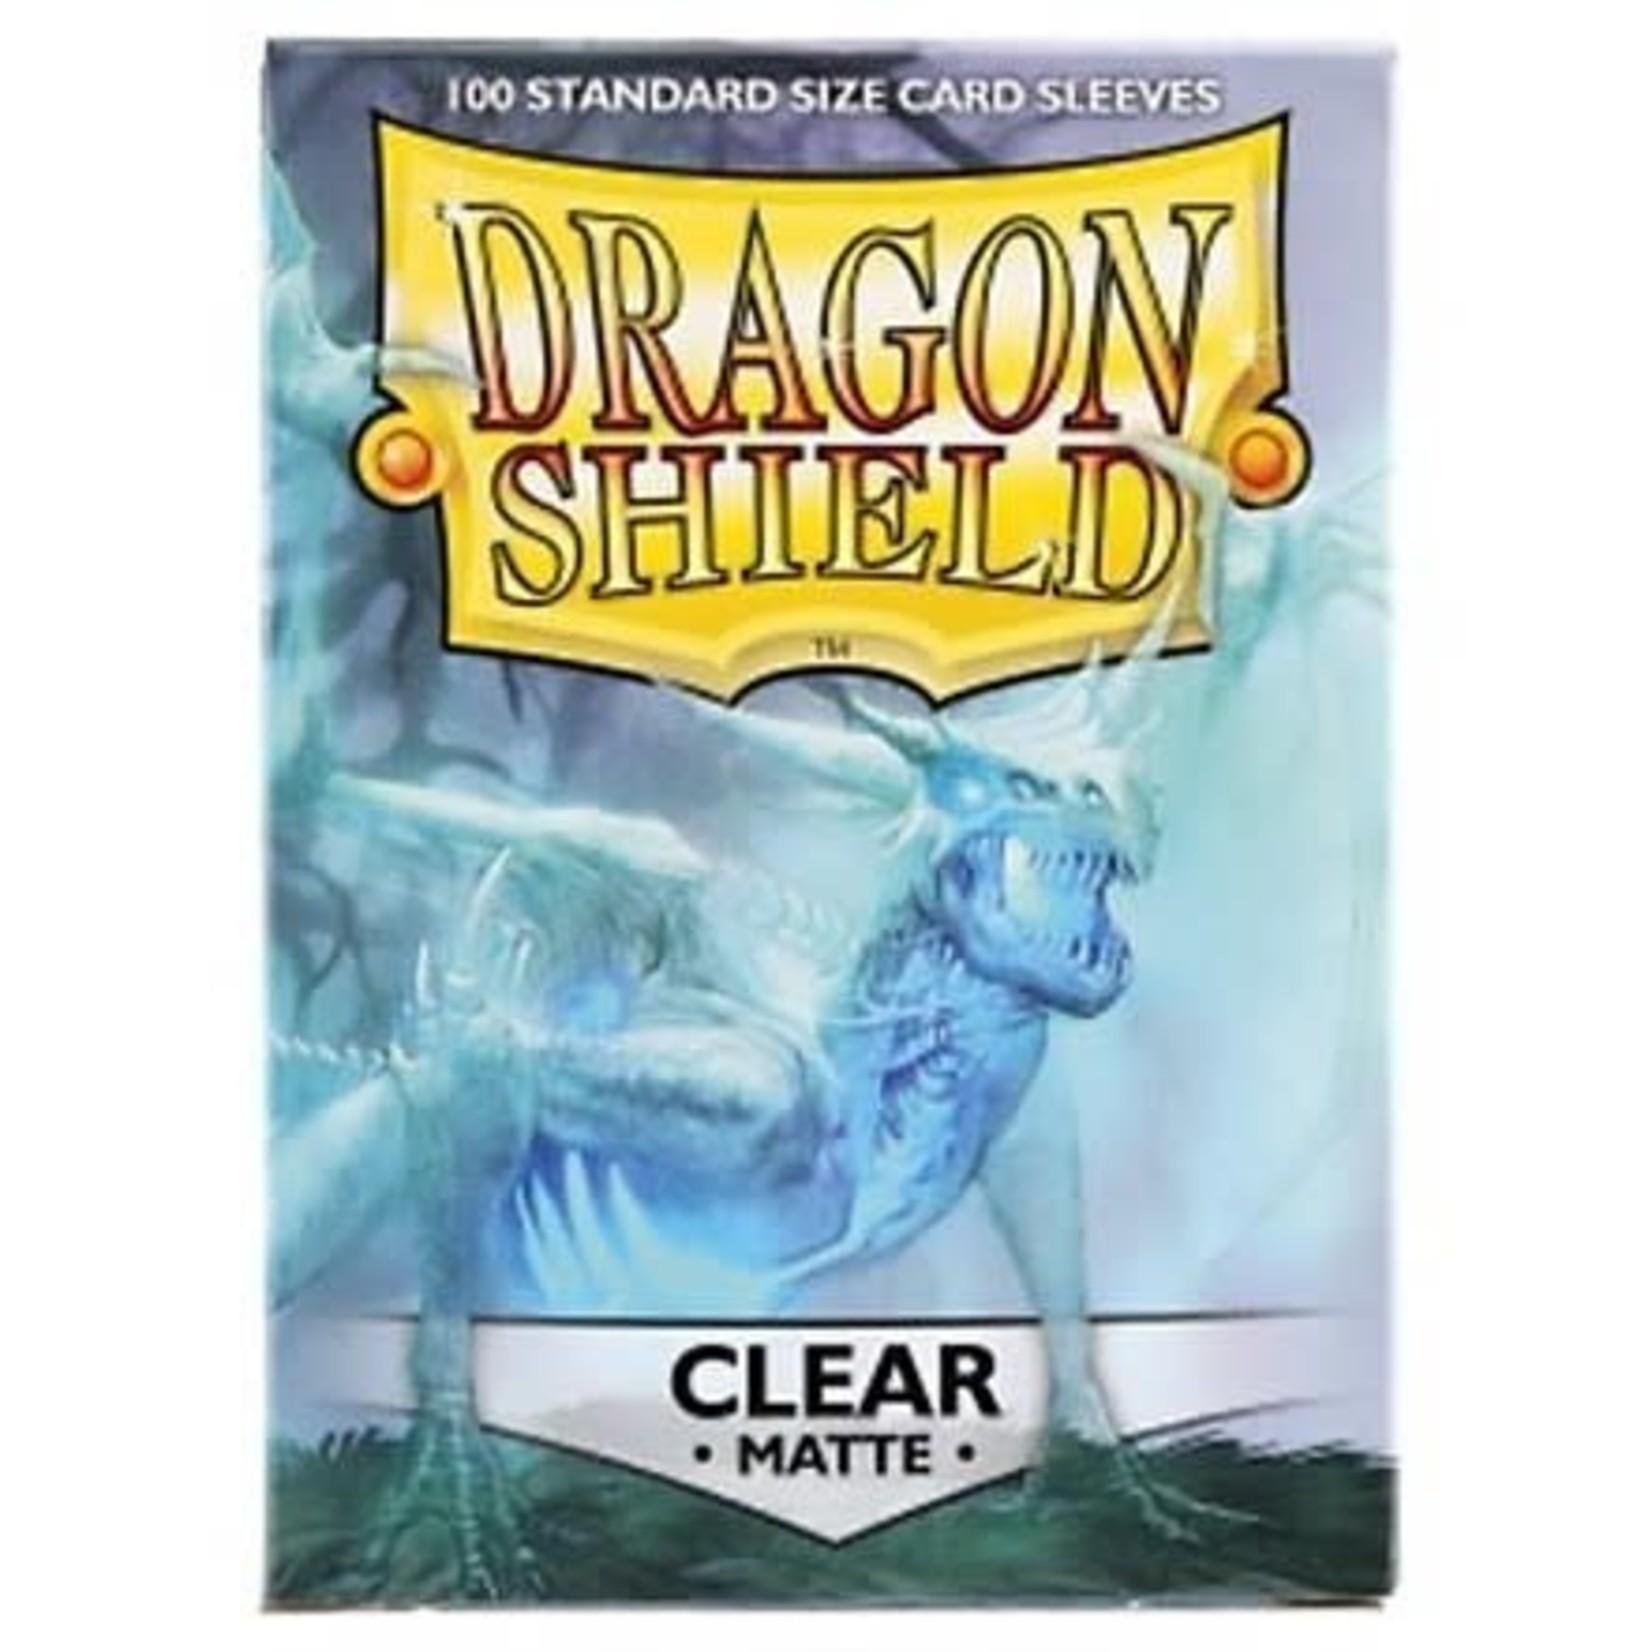 Dragon Shield Dragon Shield Matte Clear Card Sleeves (100)